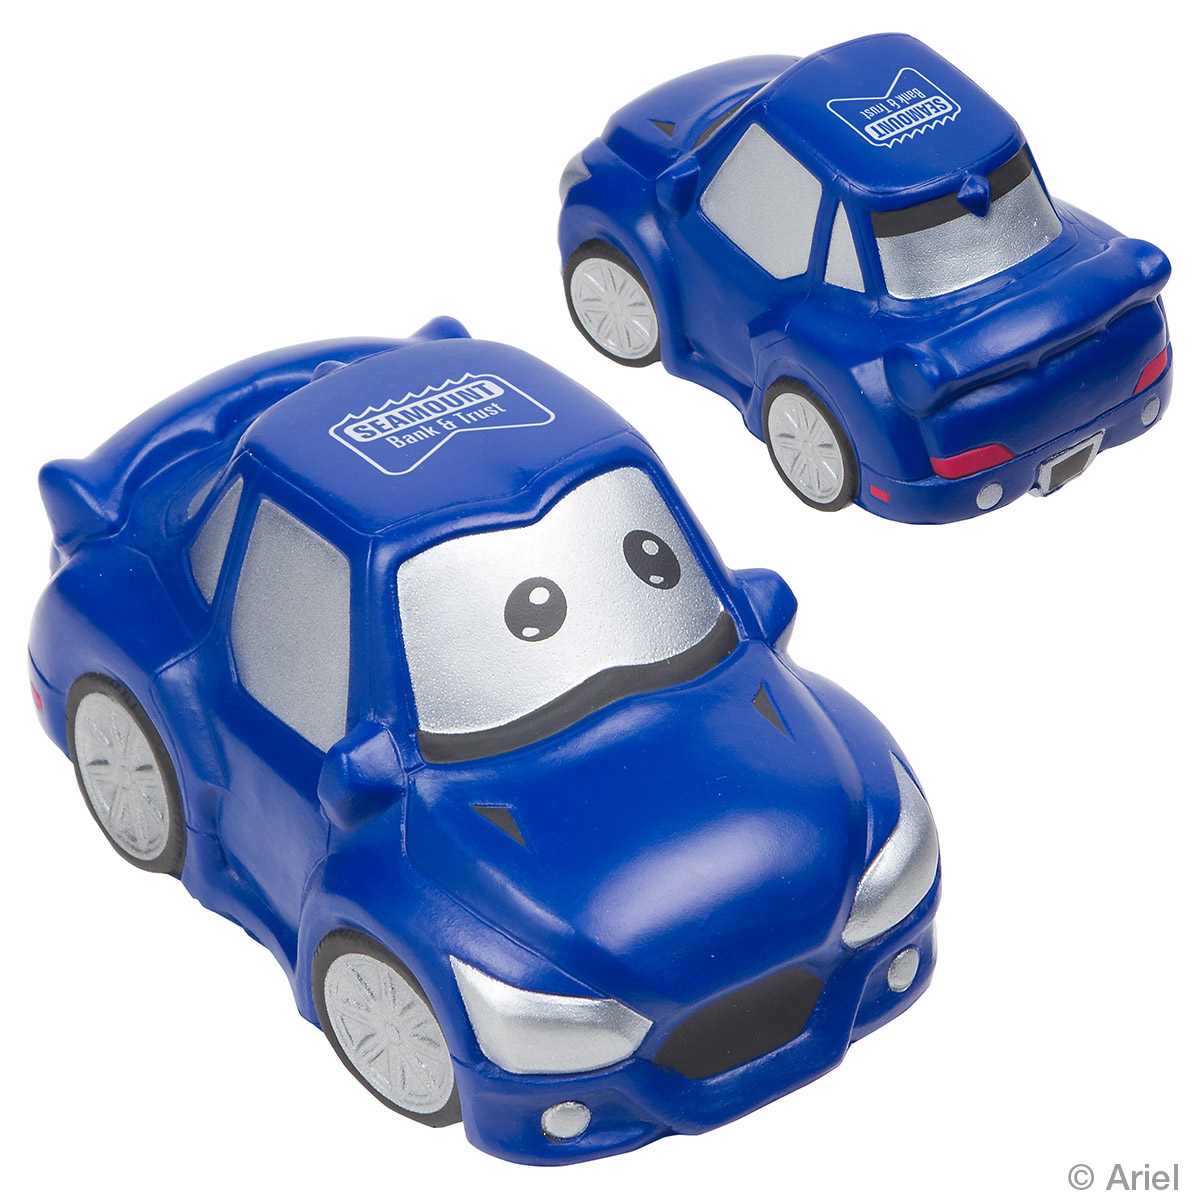 Cute Car Stress Reliever, LTR-CC17, 1 Colour Imprint